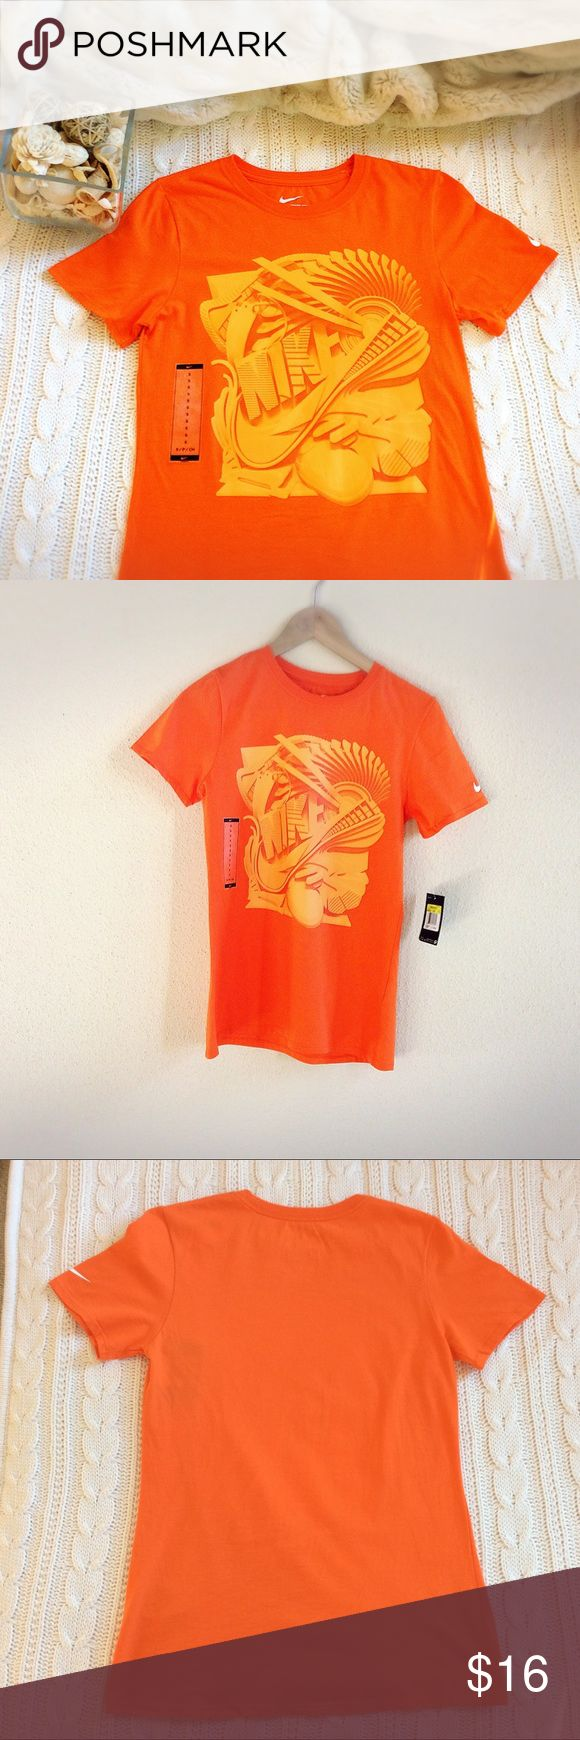 NWT Nike Orange Woman Tee Nike Wiman Orange Tee T-shirt, short sleeve, size S, New with tag, Machine wash cold Nike Tops Tees - Short Sleeve